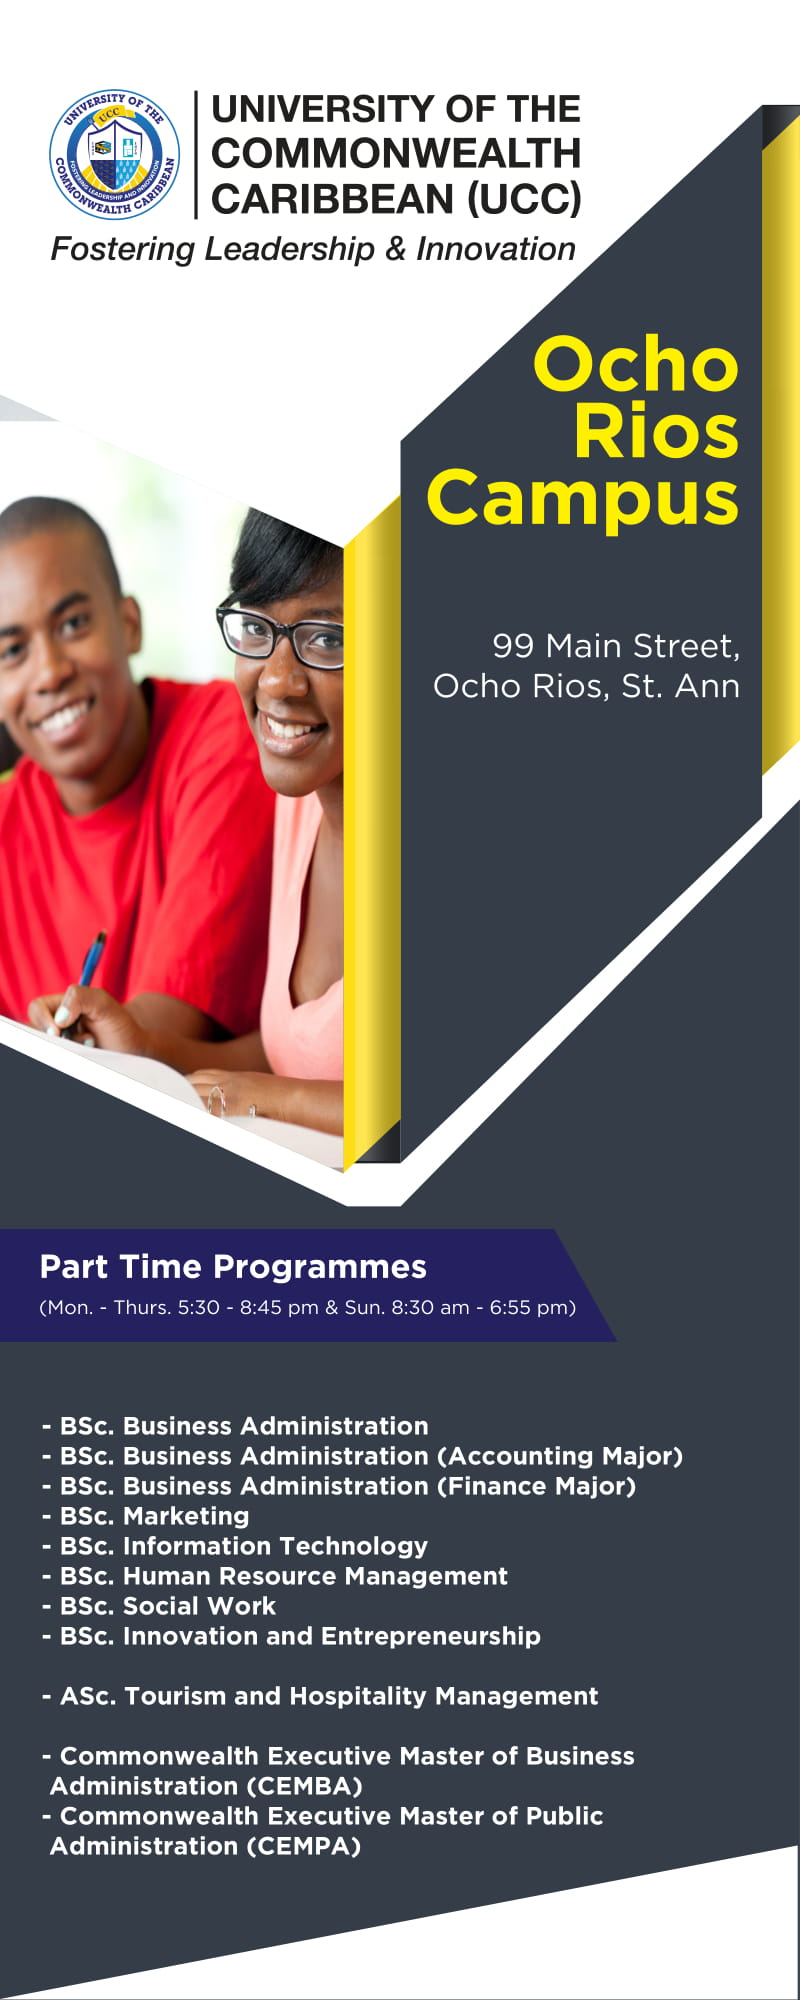 Ocho Rios Campus   The University of the Commonwealth Caribbean